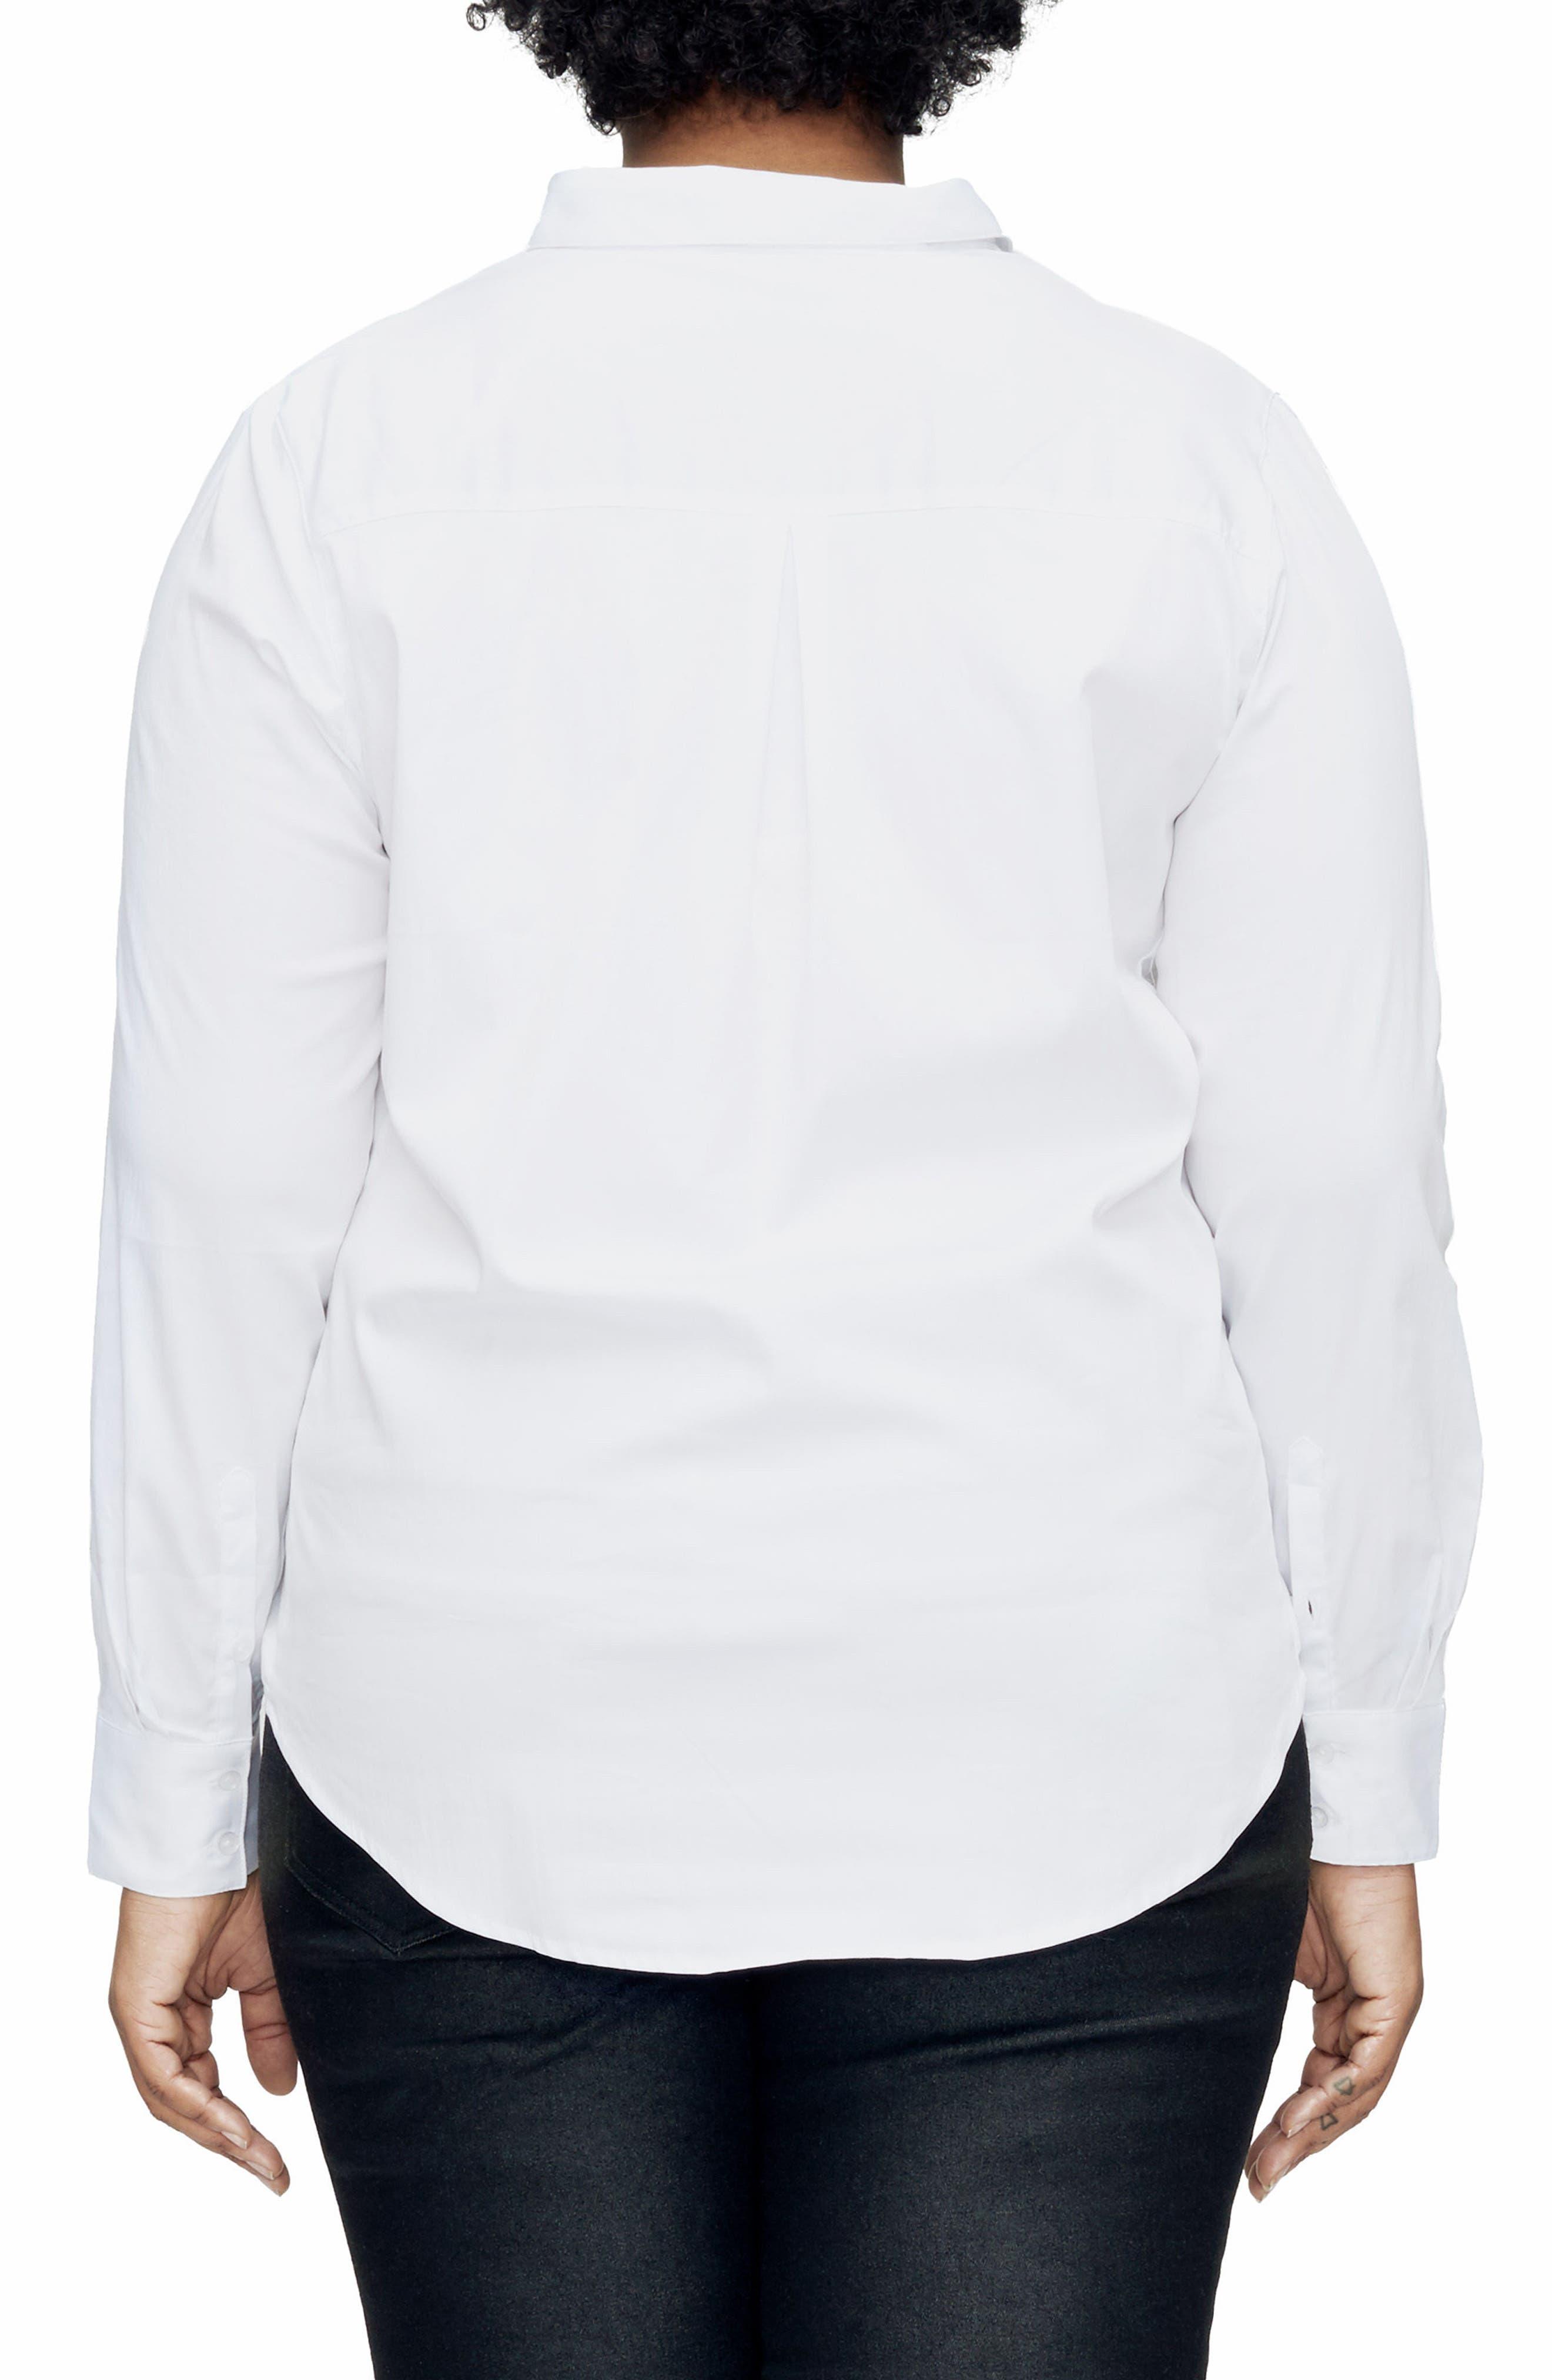 Elbe Shirt,                             Alternate thumbnail 2, color,                             White